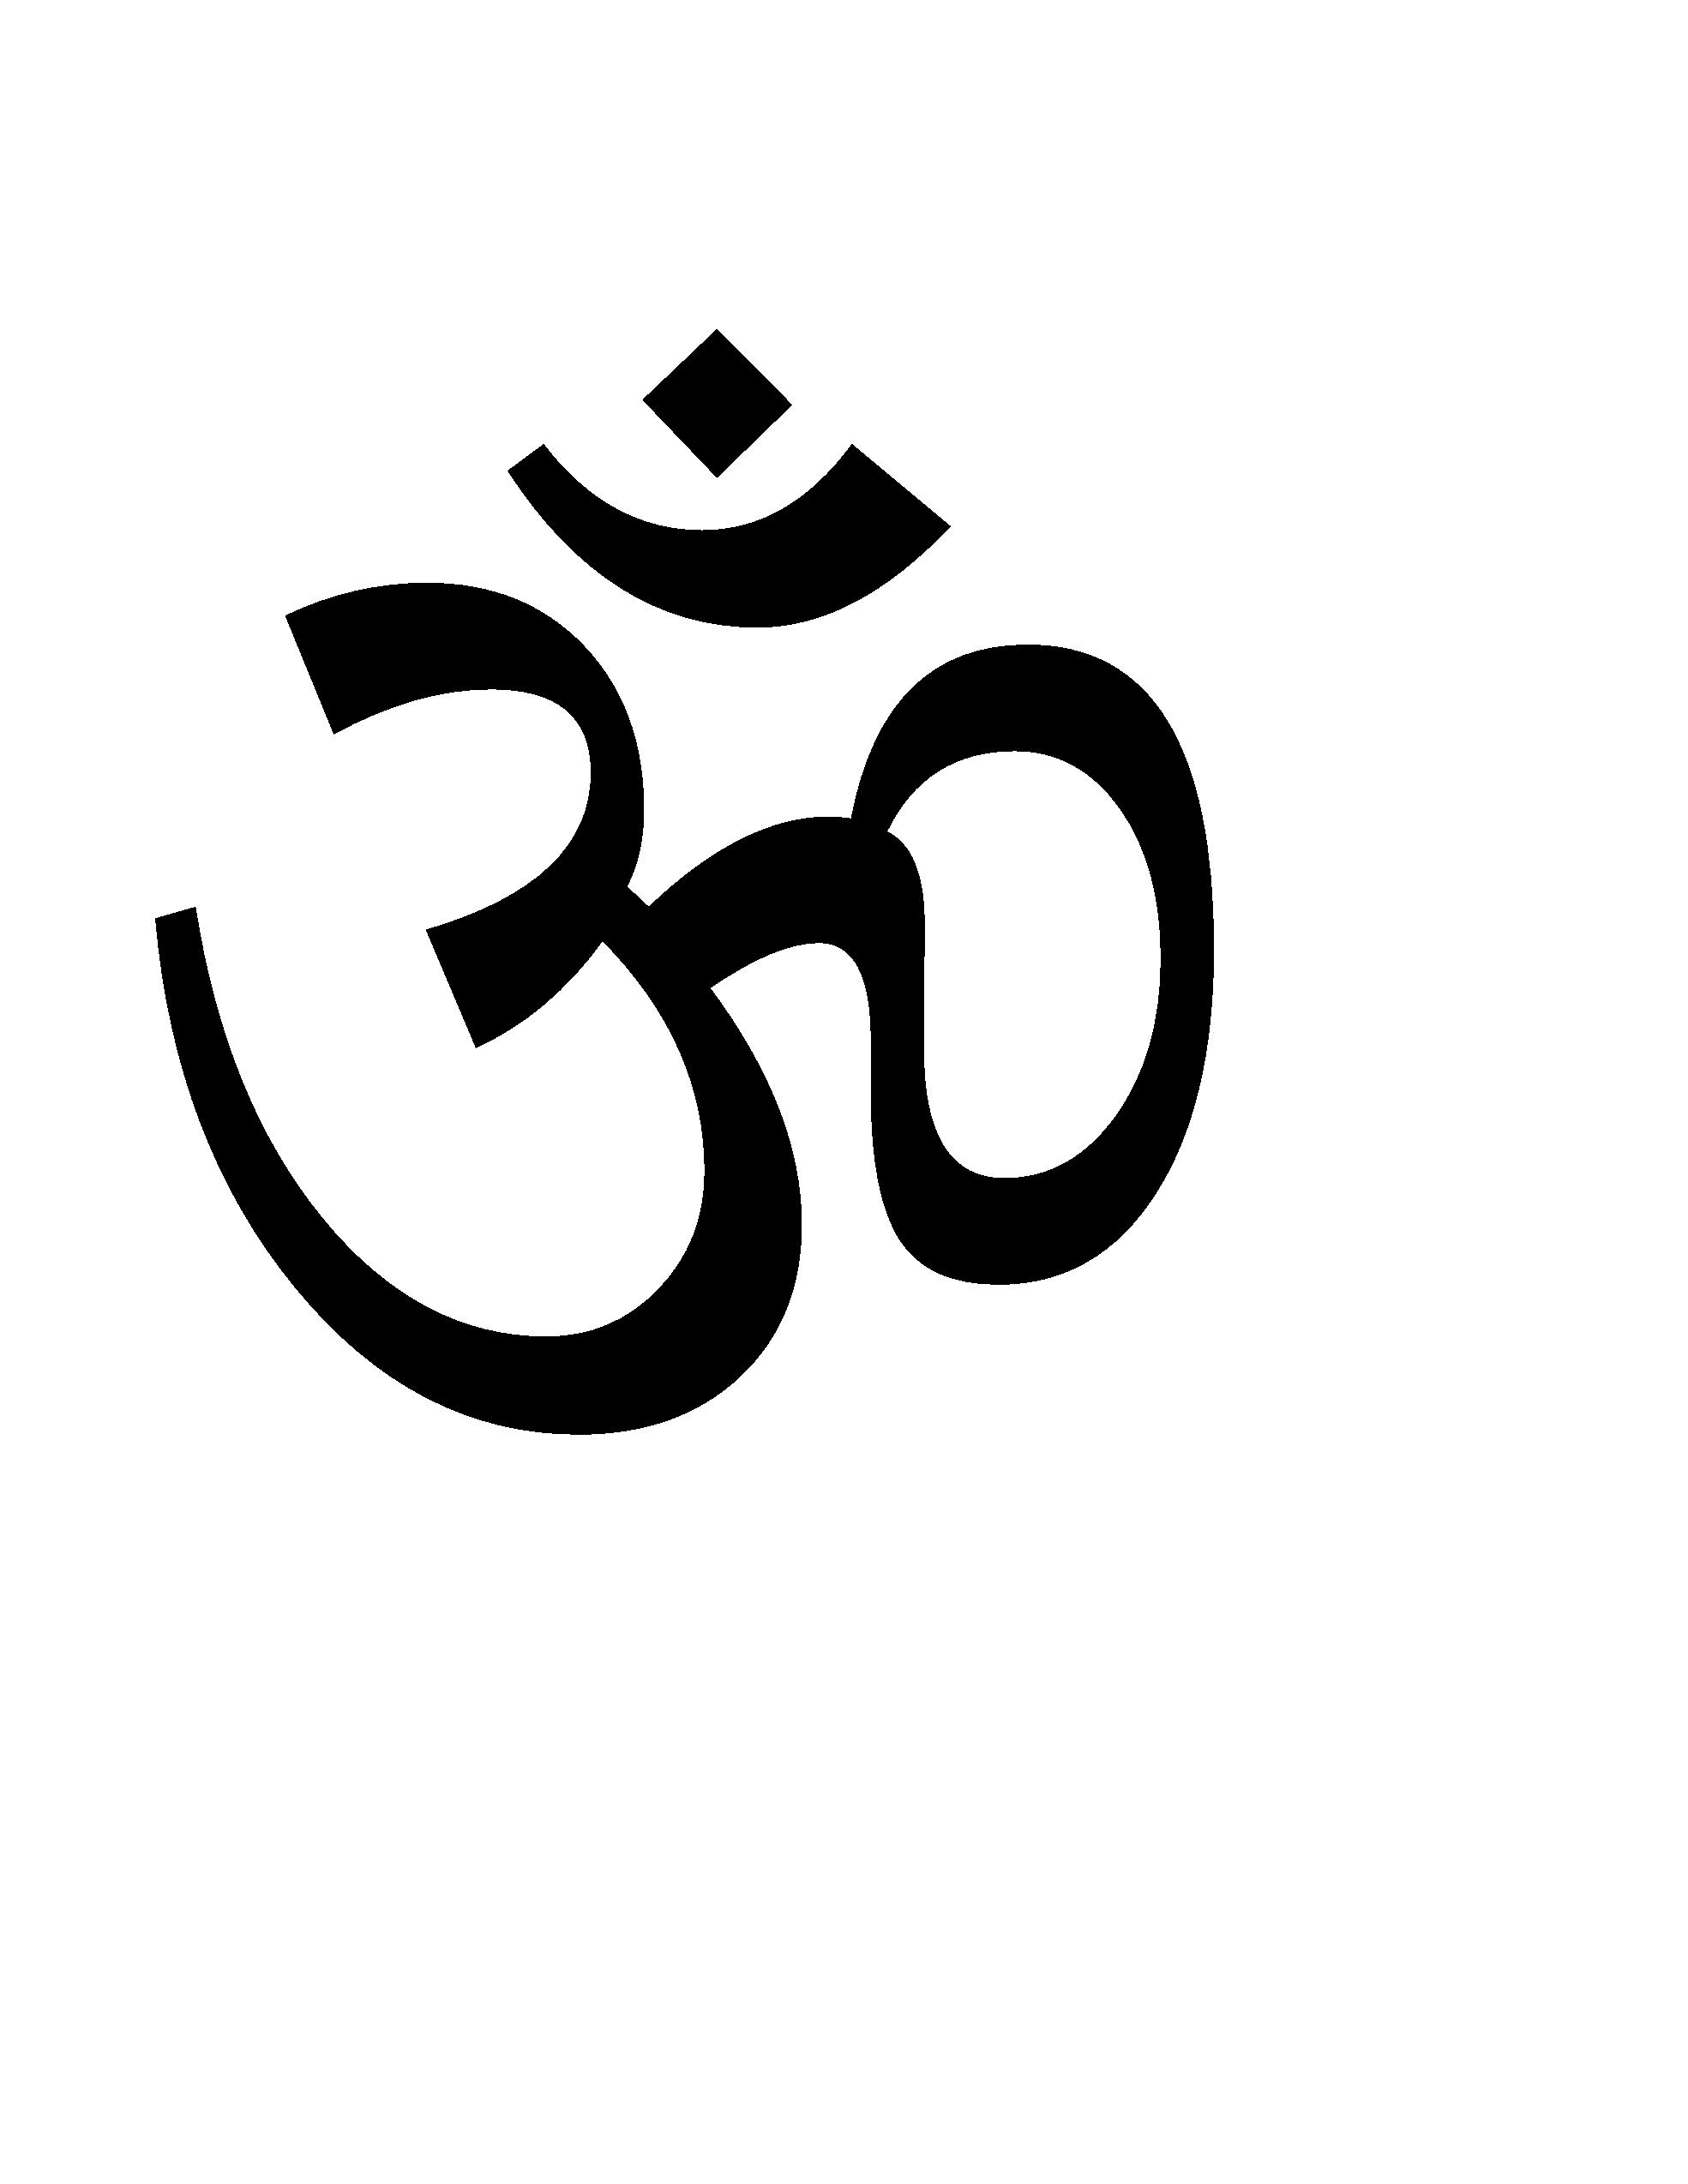 Om HD PNG - 91190